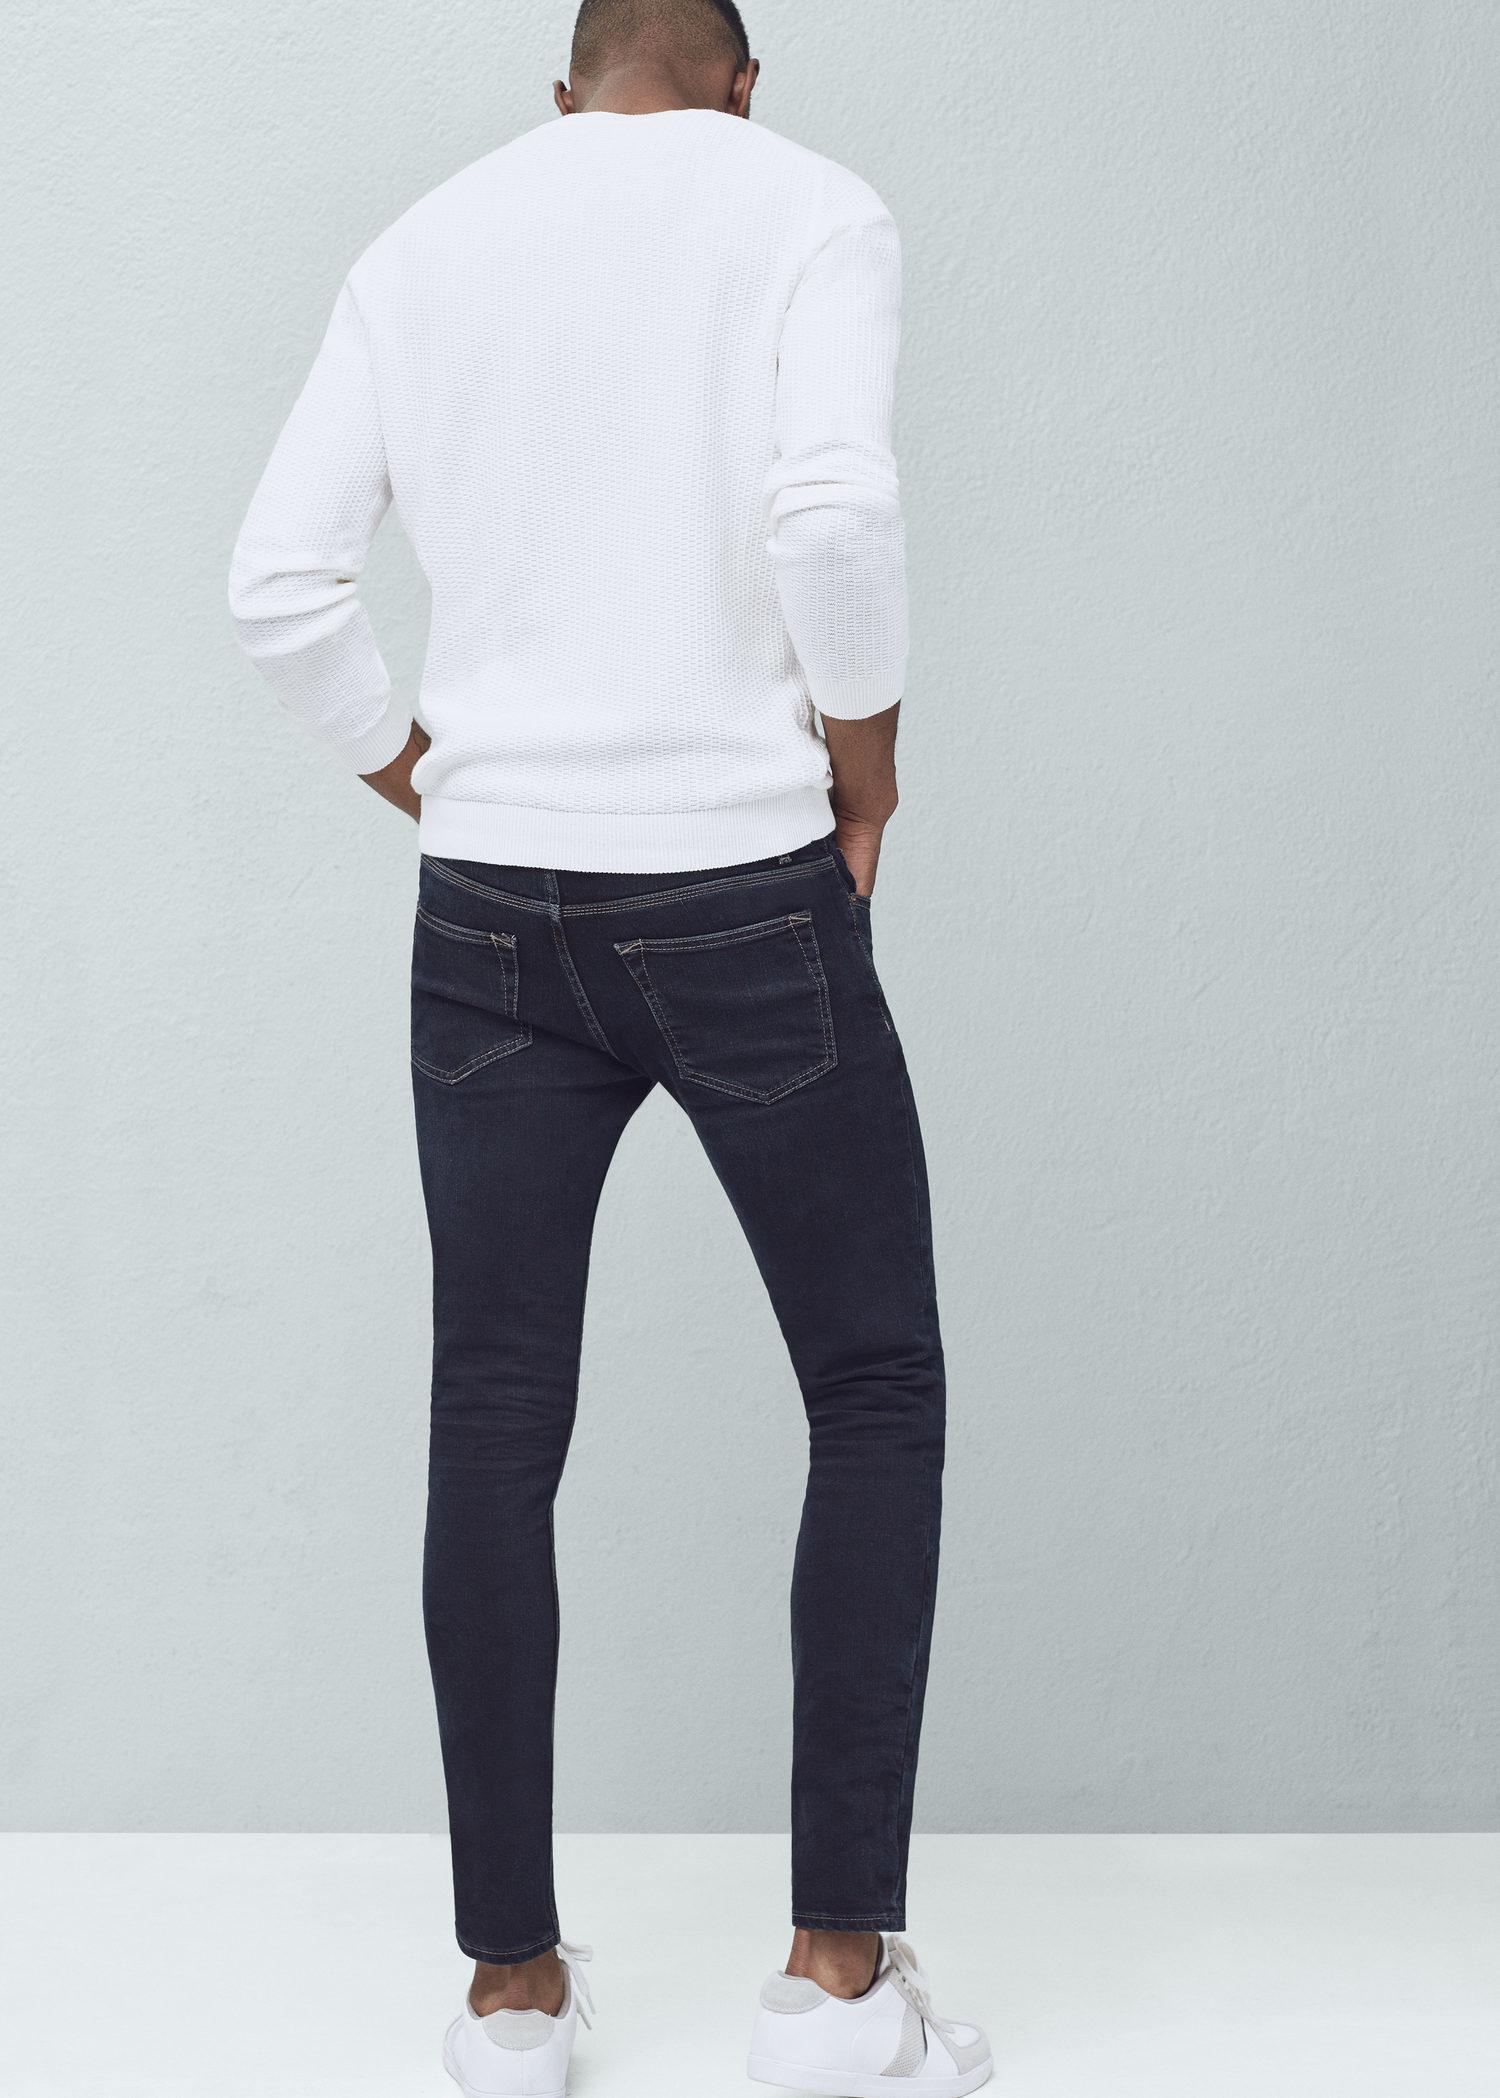 e9c73e705d4 Lyst - Mango Skinny Dark Wash Jude Jeans in Blue for Men